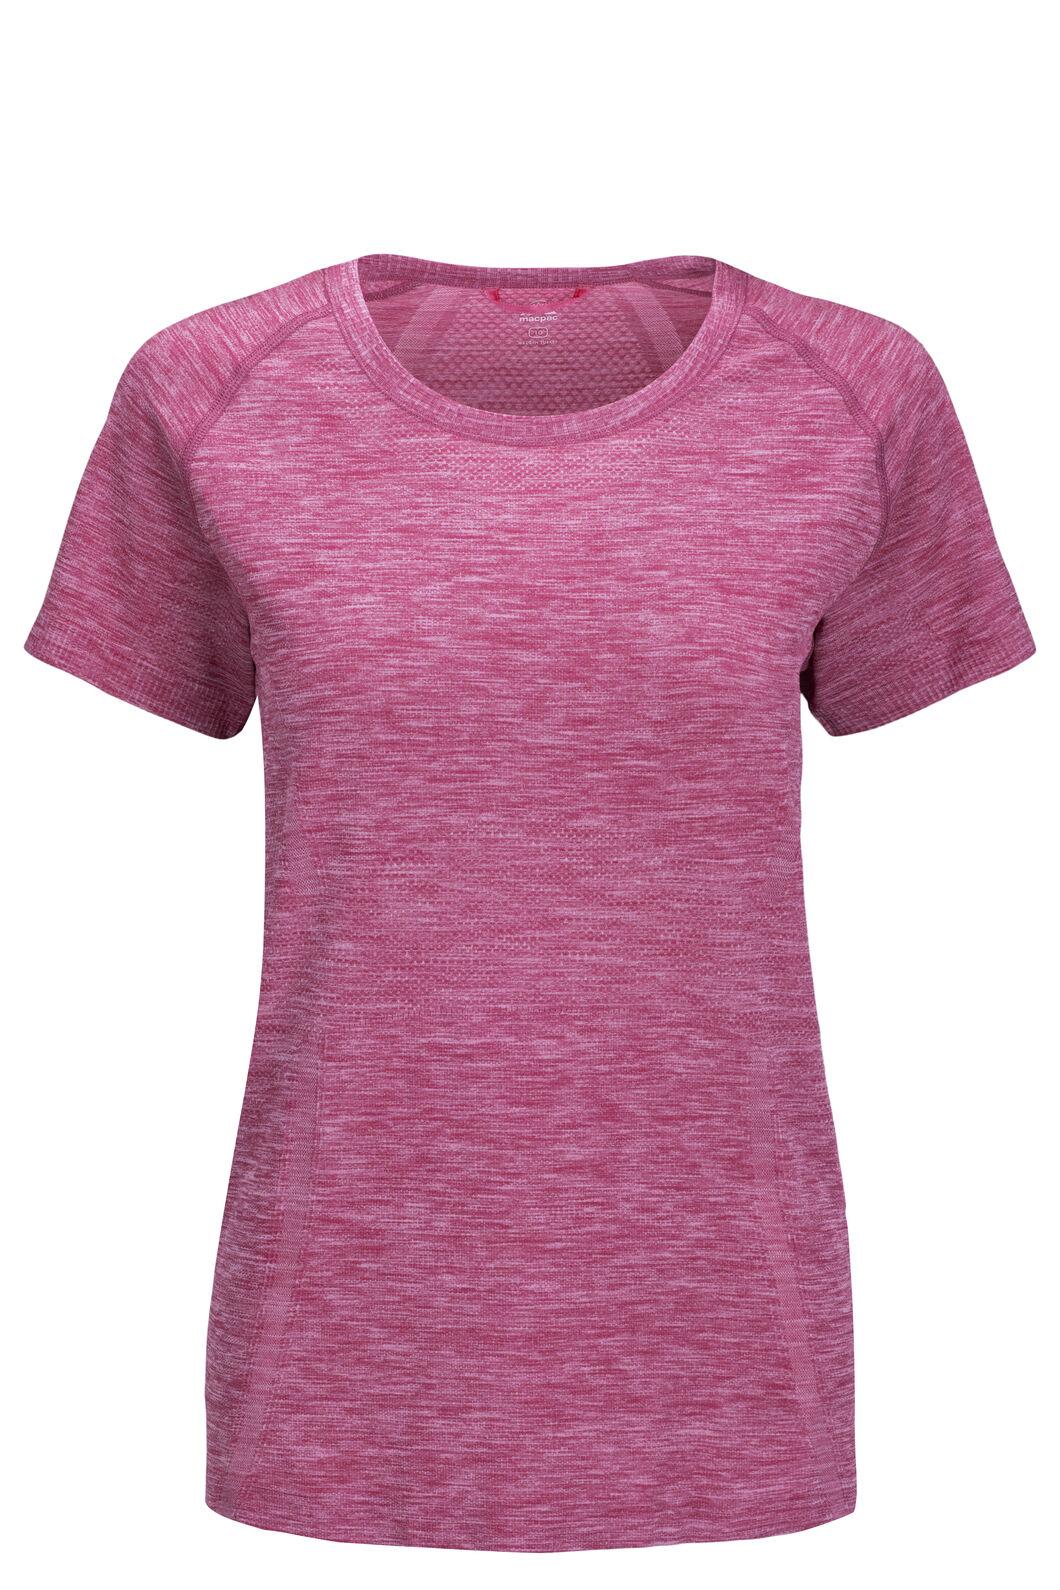 Macpac Limitless Short Sleeve Tee — Women's, Purple Orchid, hi-res